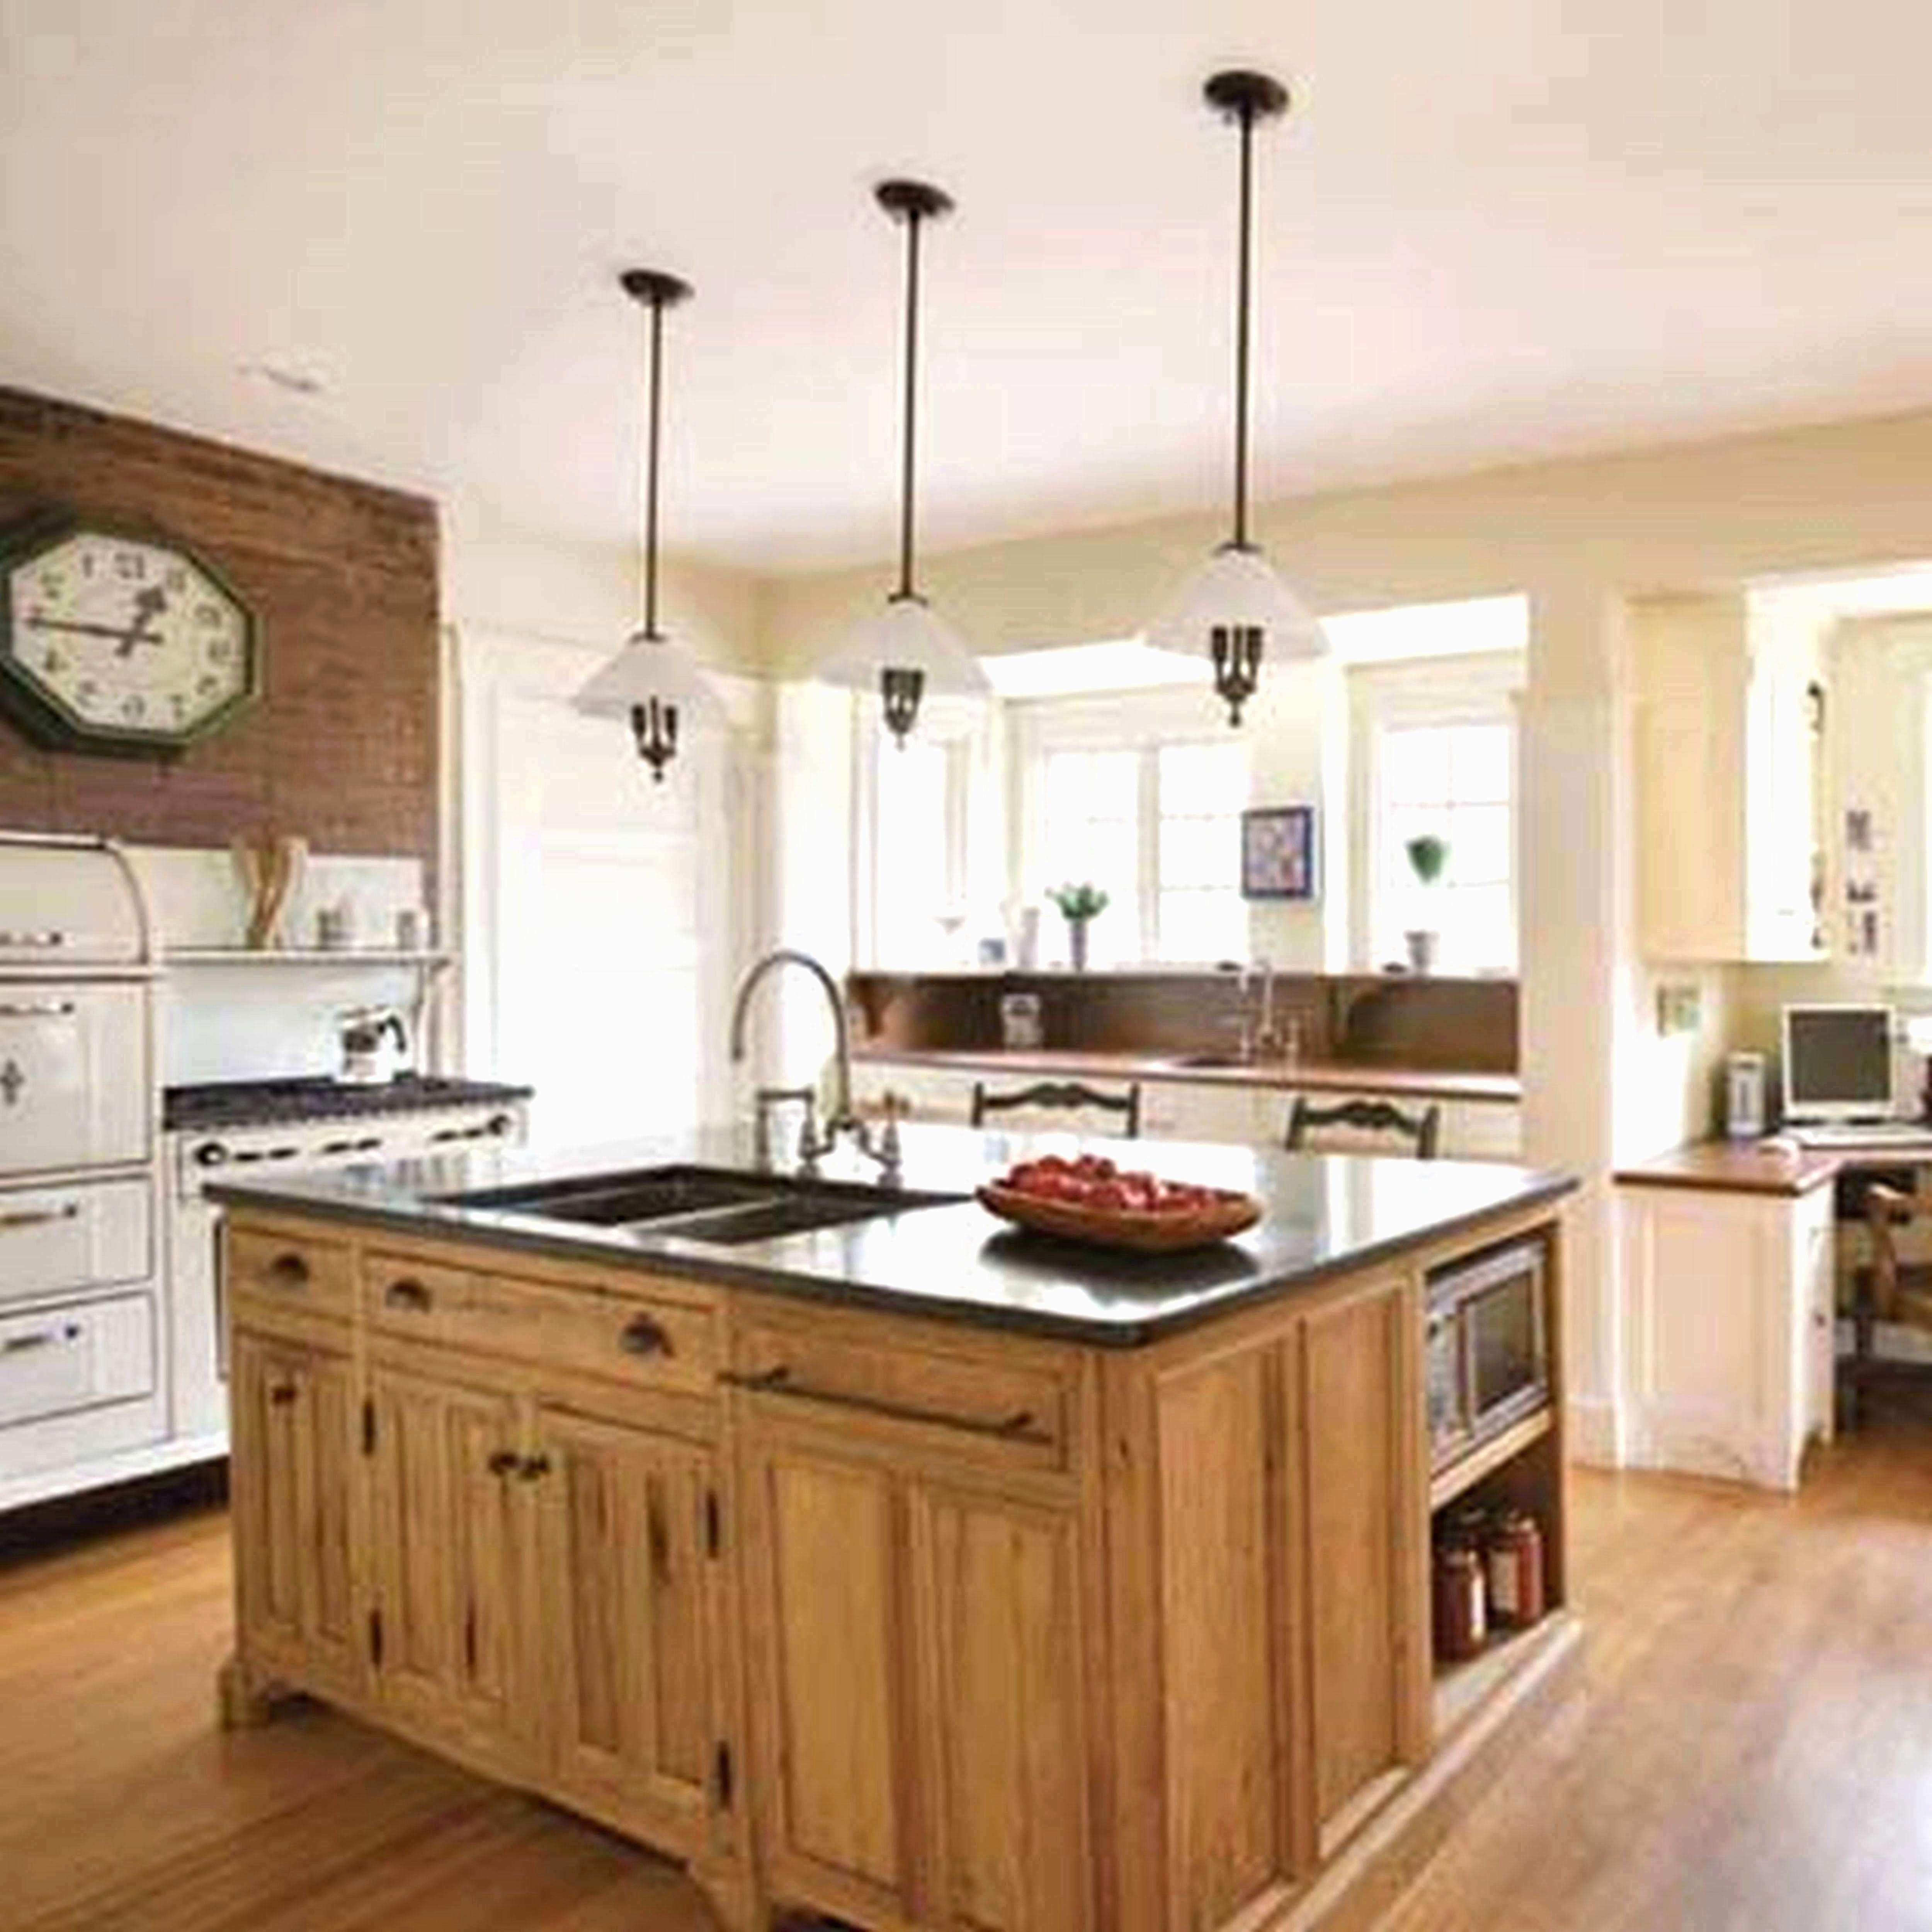 Images of kitchen cabinets and floors new kitchen backsplashes